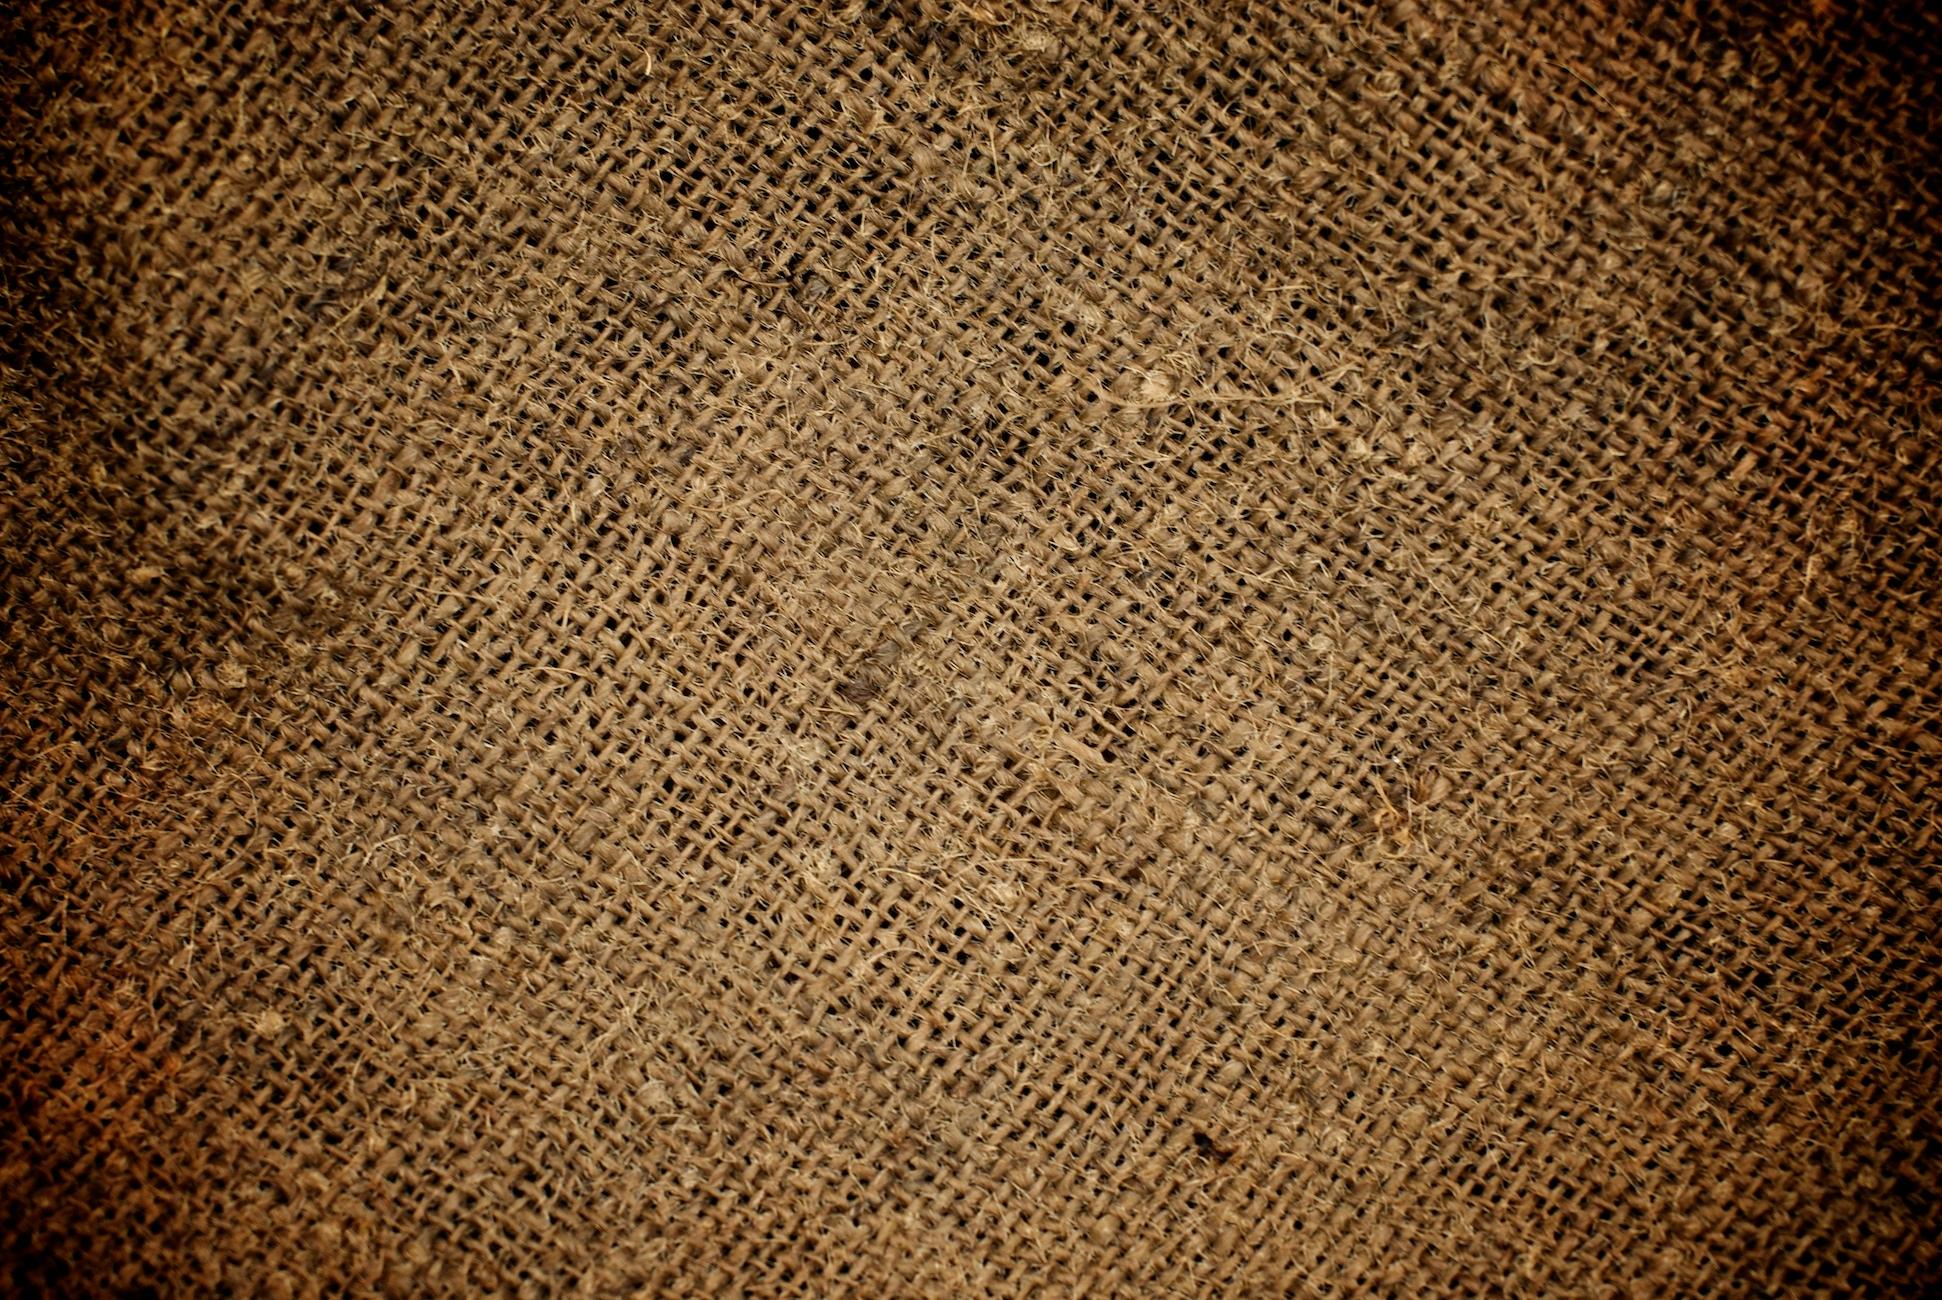 brown burlap texture background - photo #13